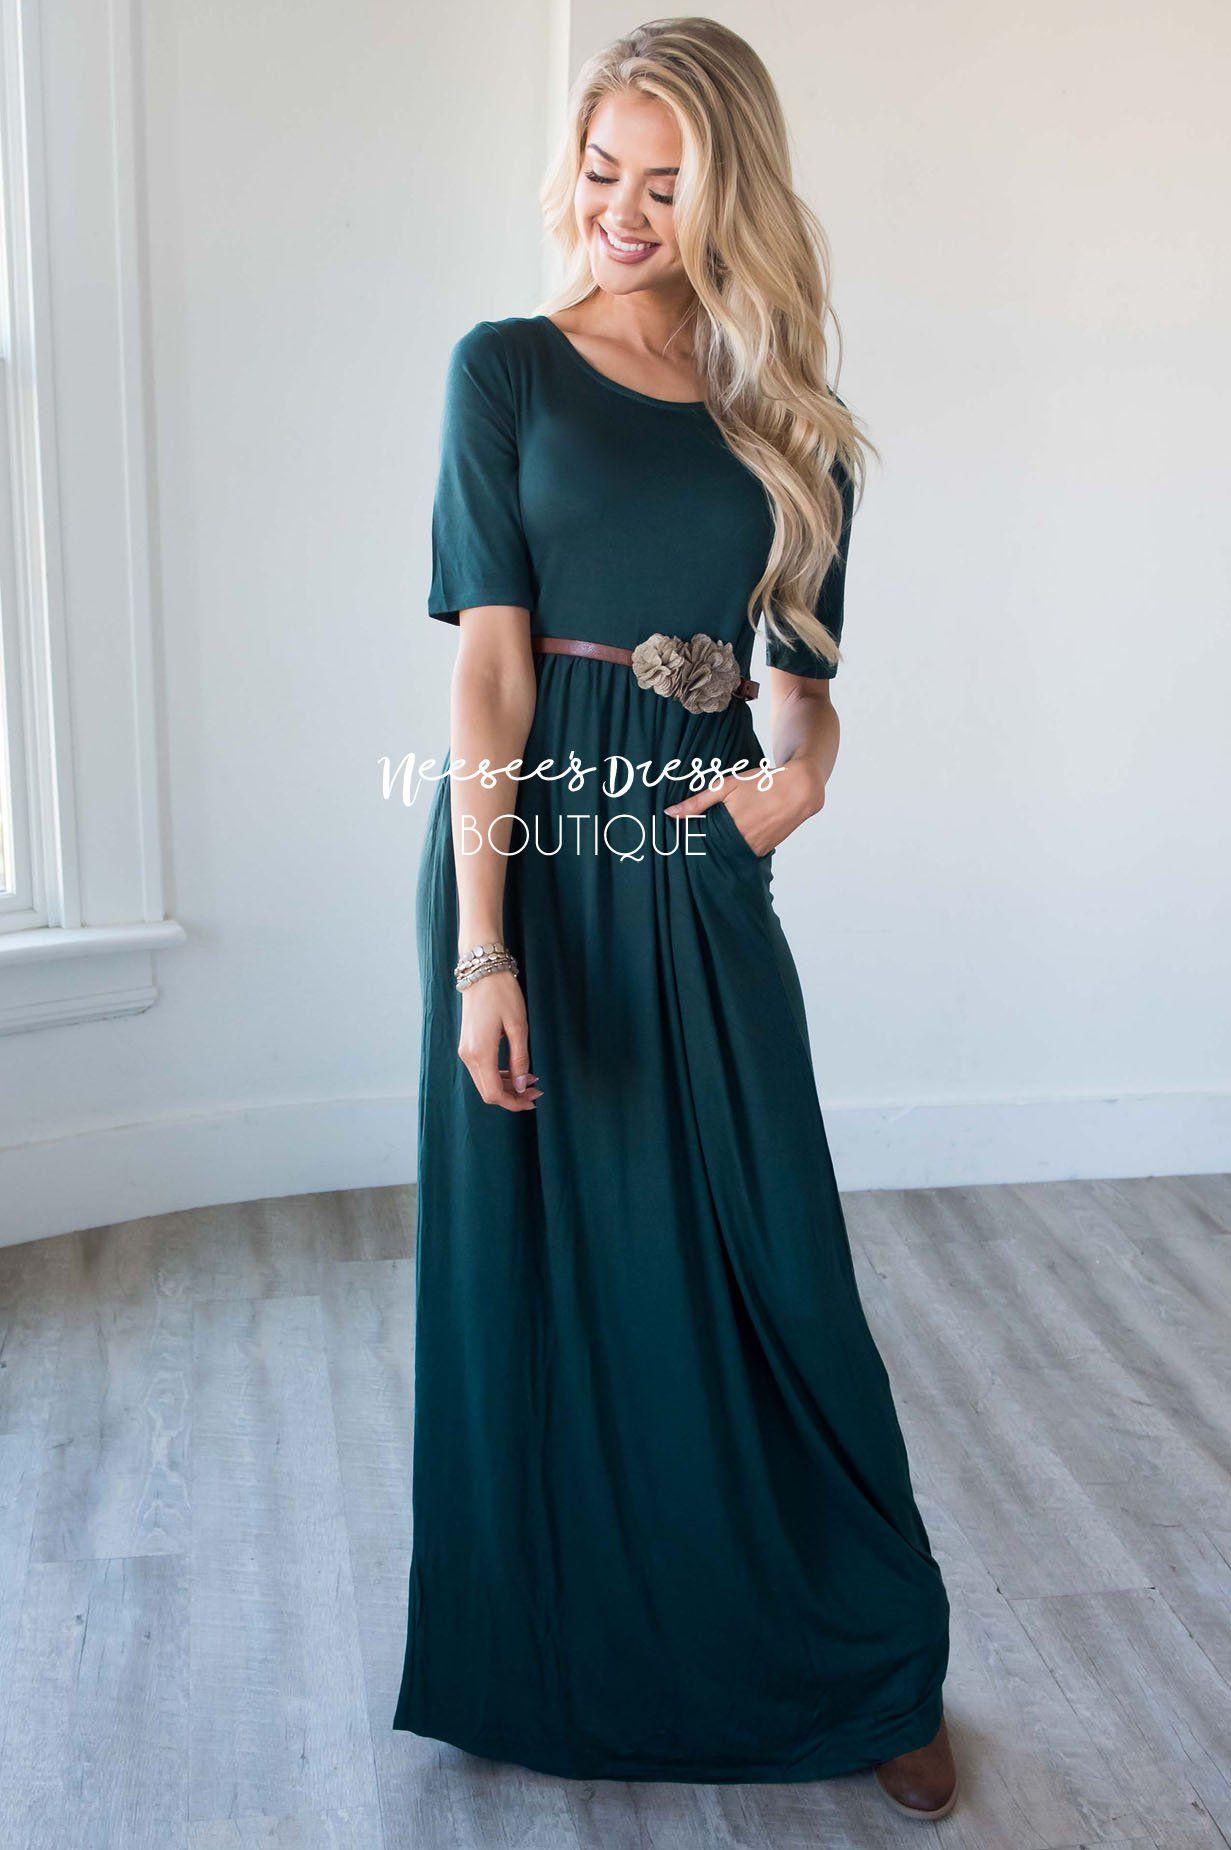 5b9faeb9f8aa Emerald Maxi Pocket Dress | Best Place To Buy Modest Dresses Online -  Neesee's Dresses